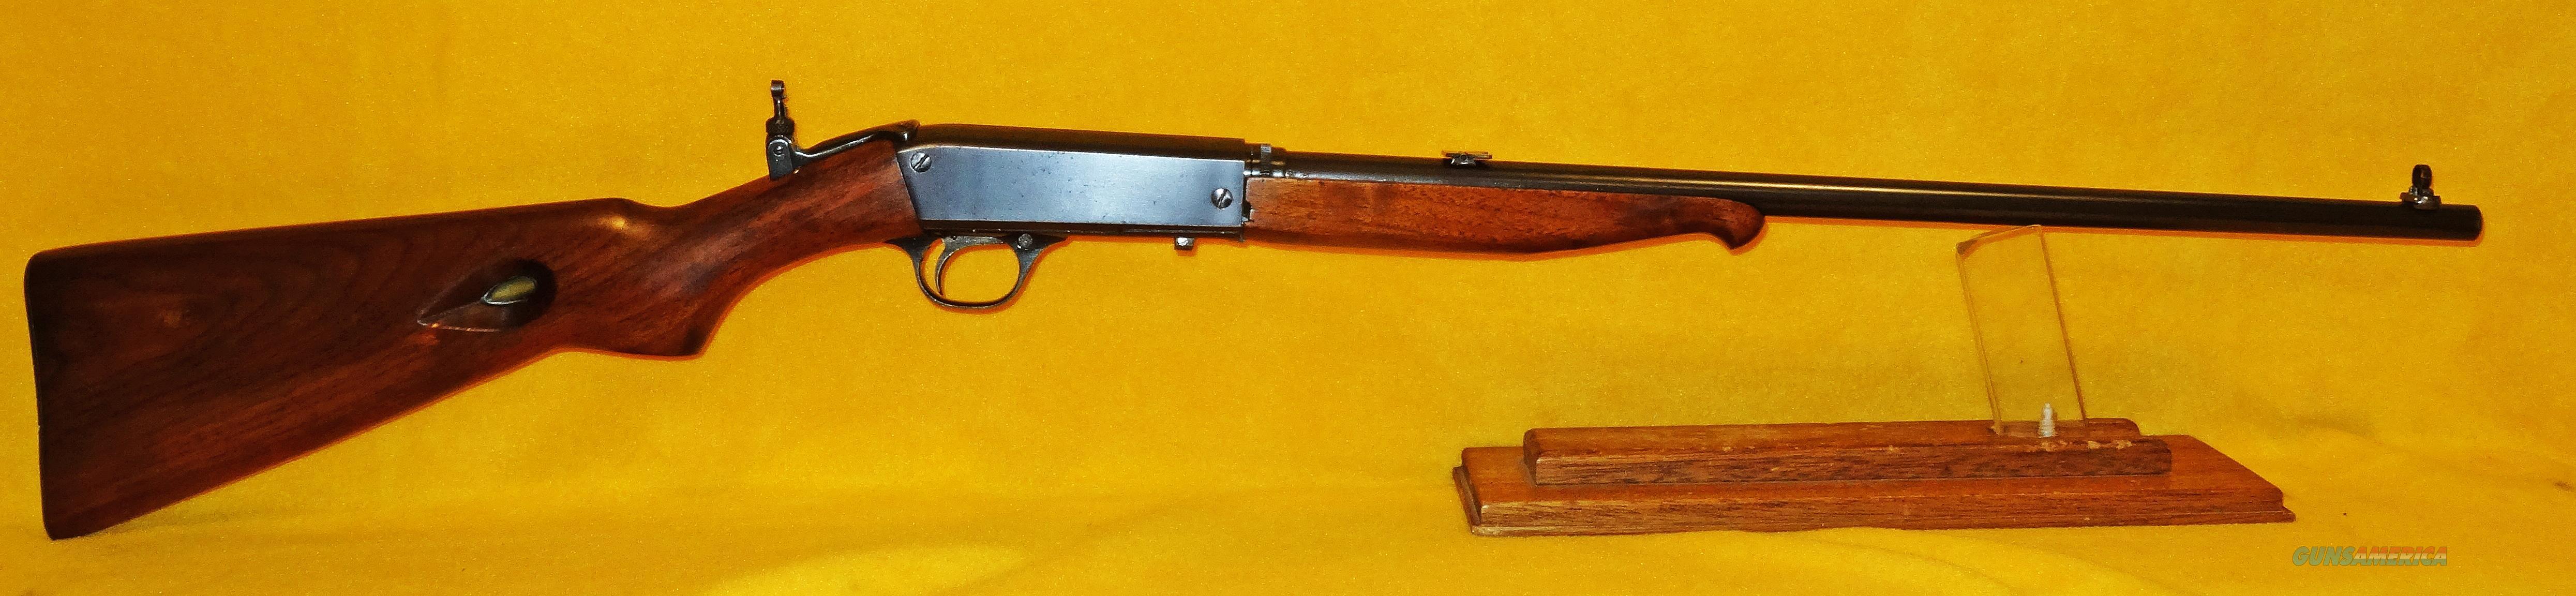 REMINGTON 24  Guns > Rifles > Remington Rifles - Modern > .22 Rimfire Models